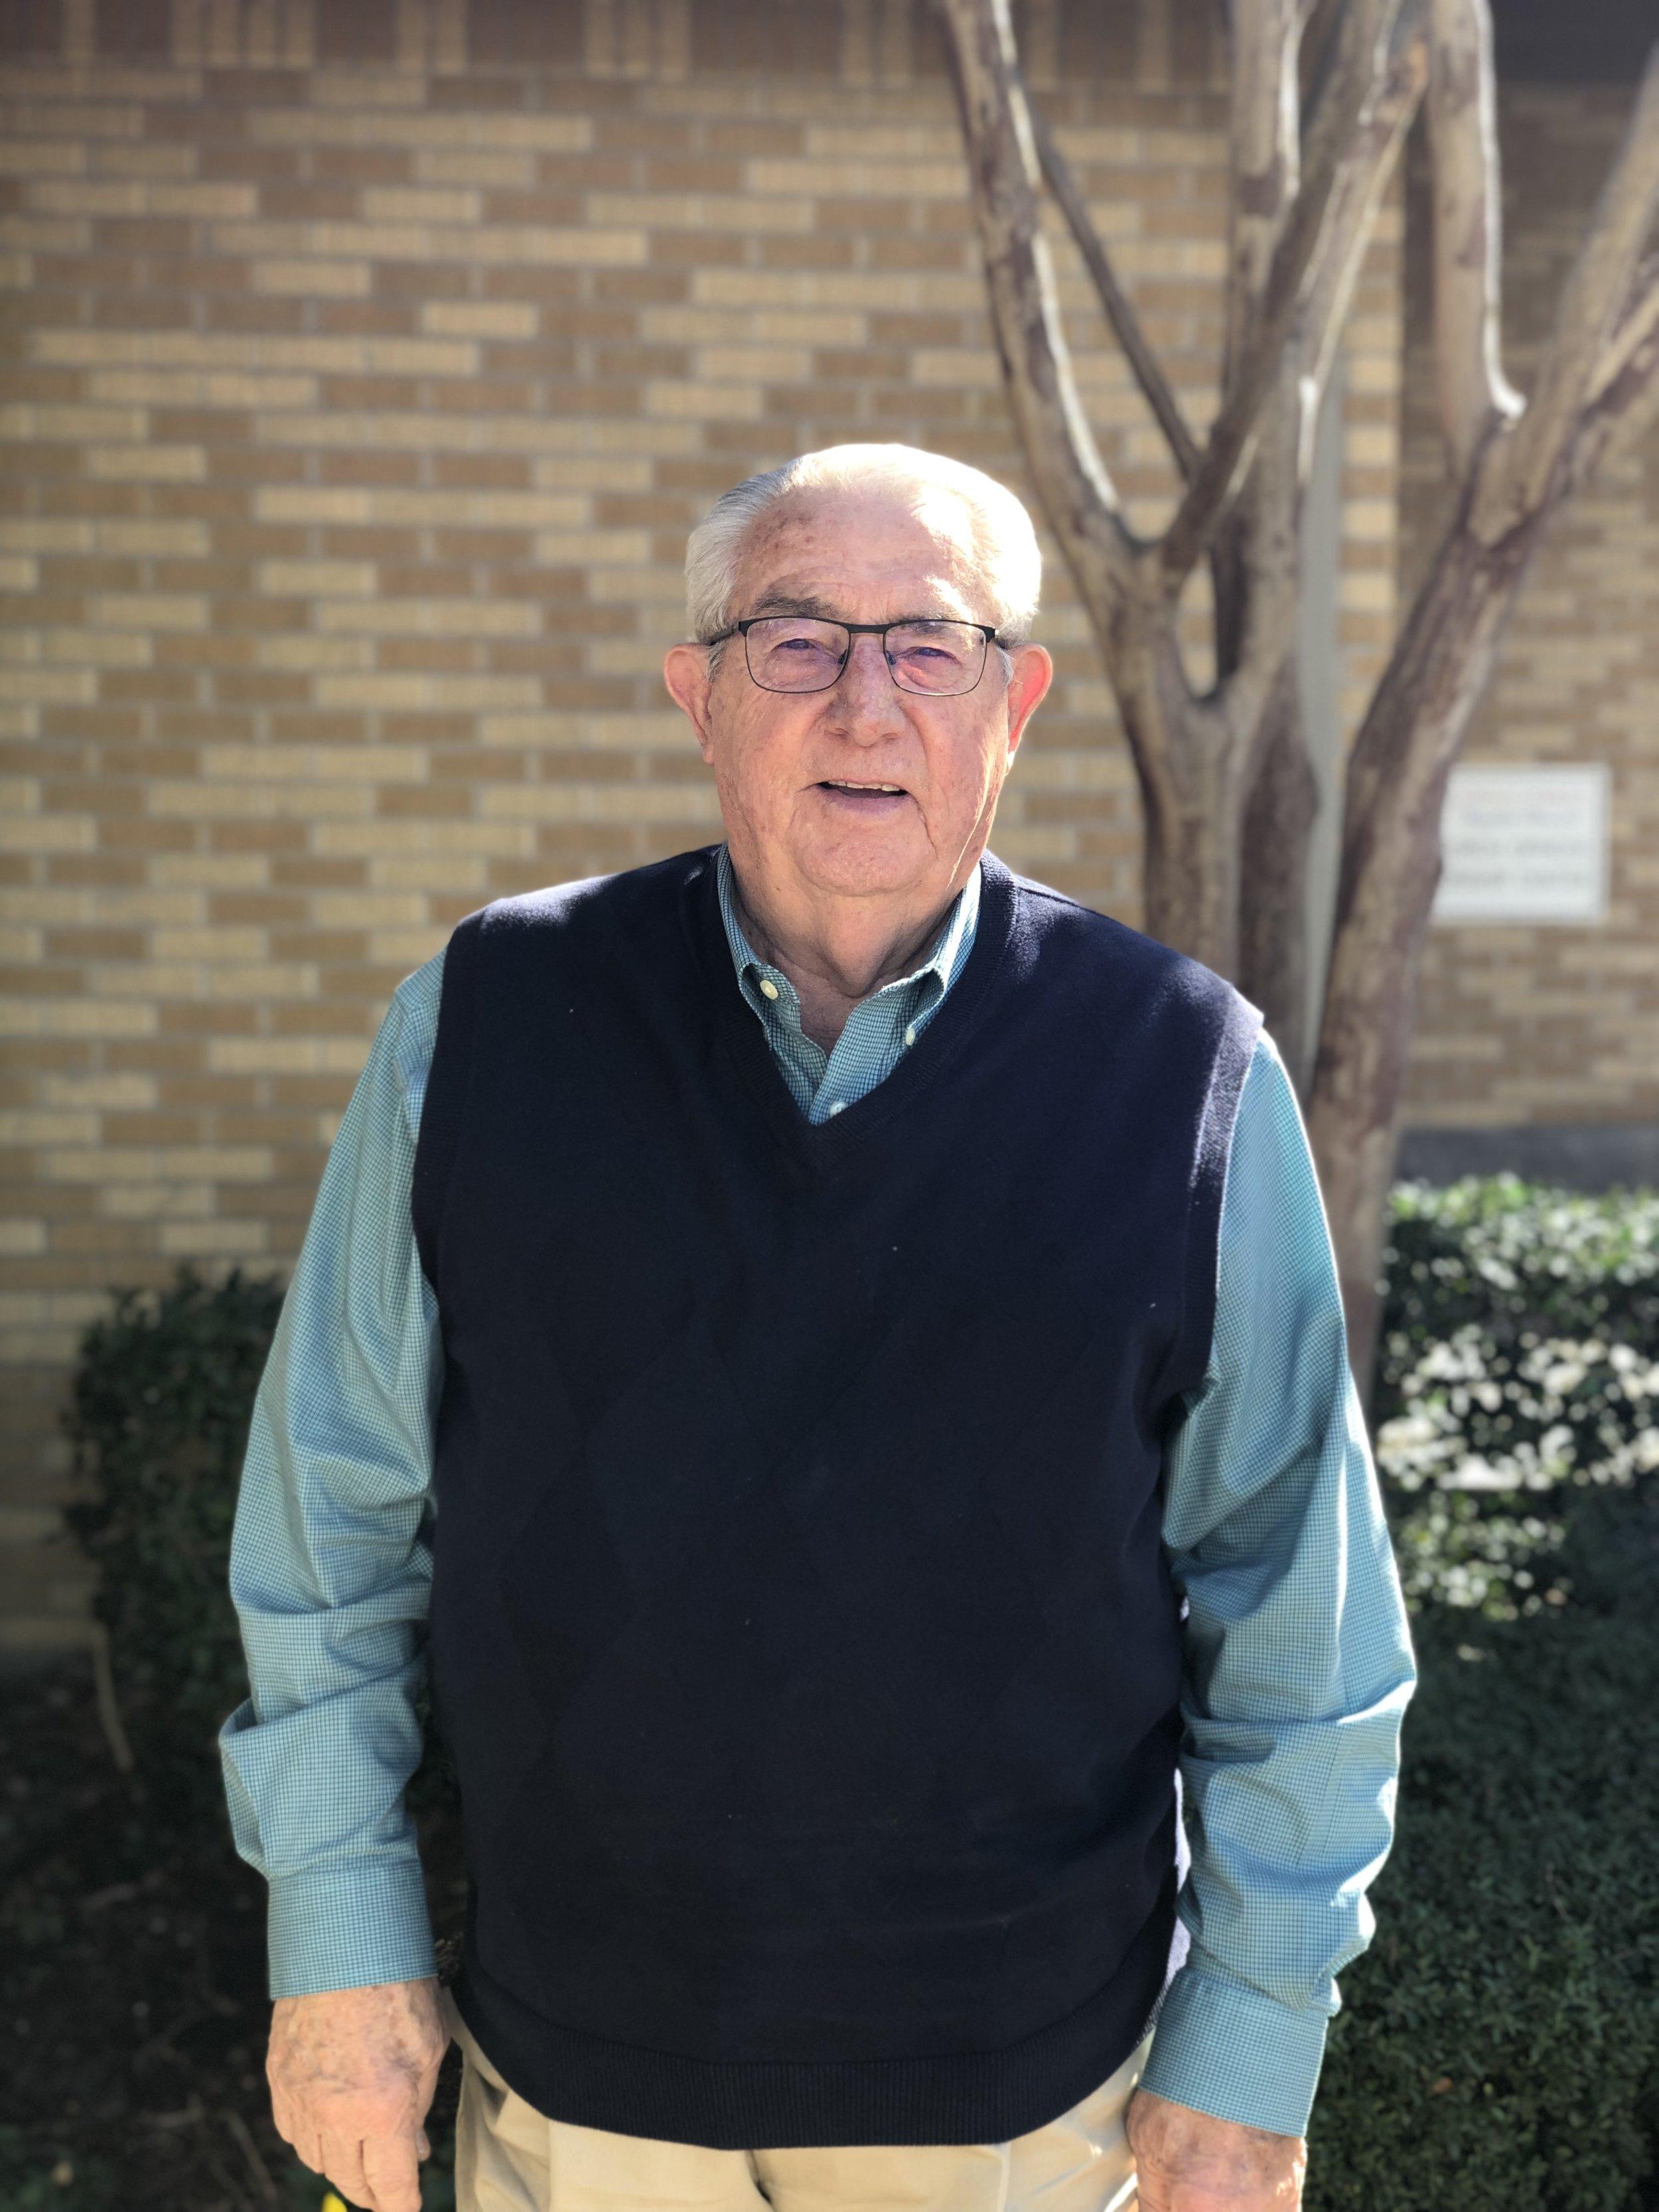 John glover - Associate PastorOctober 2004-present